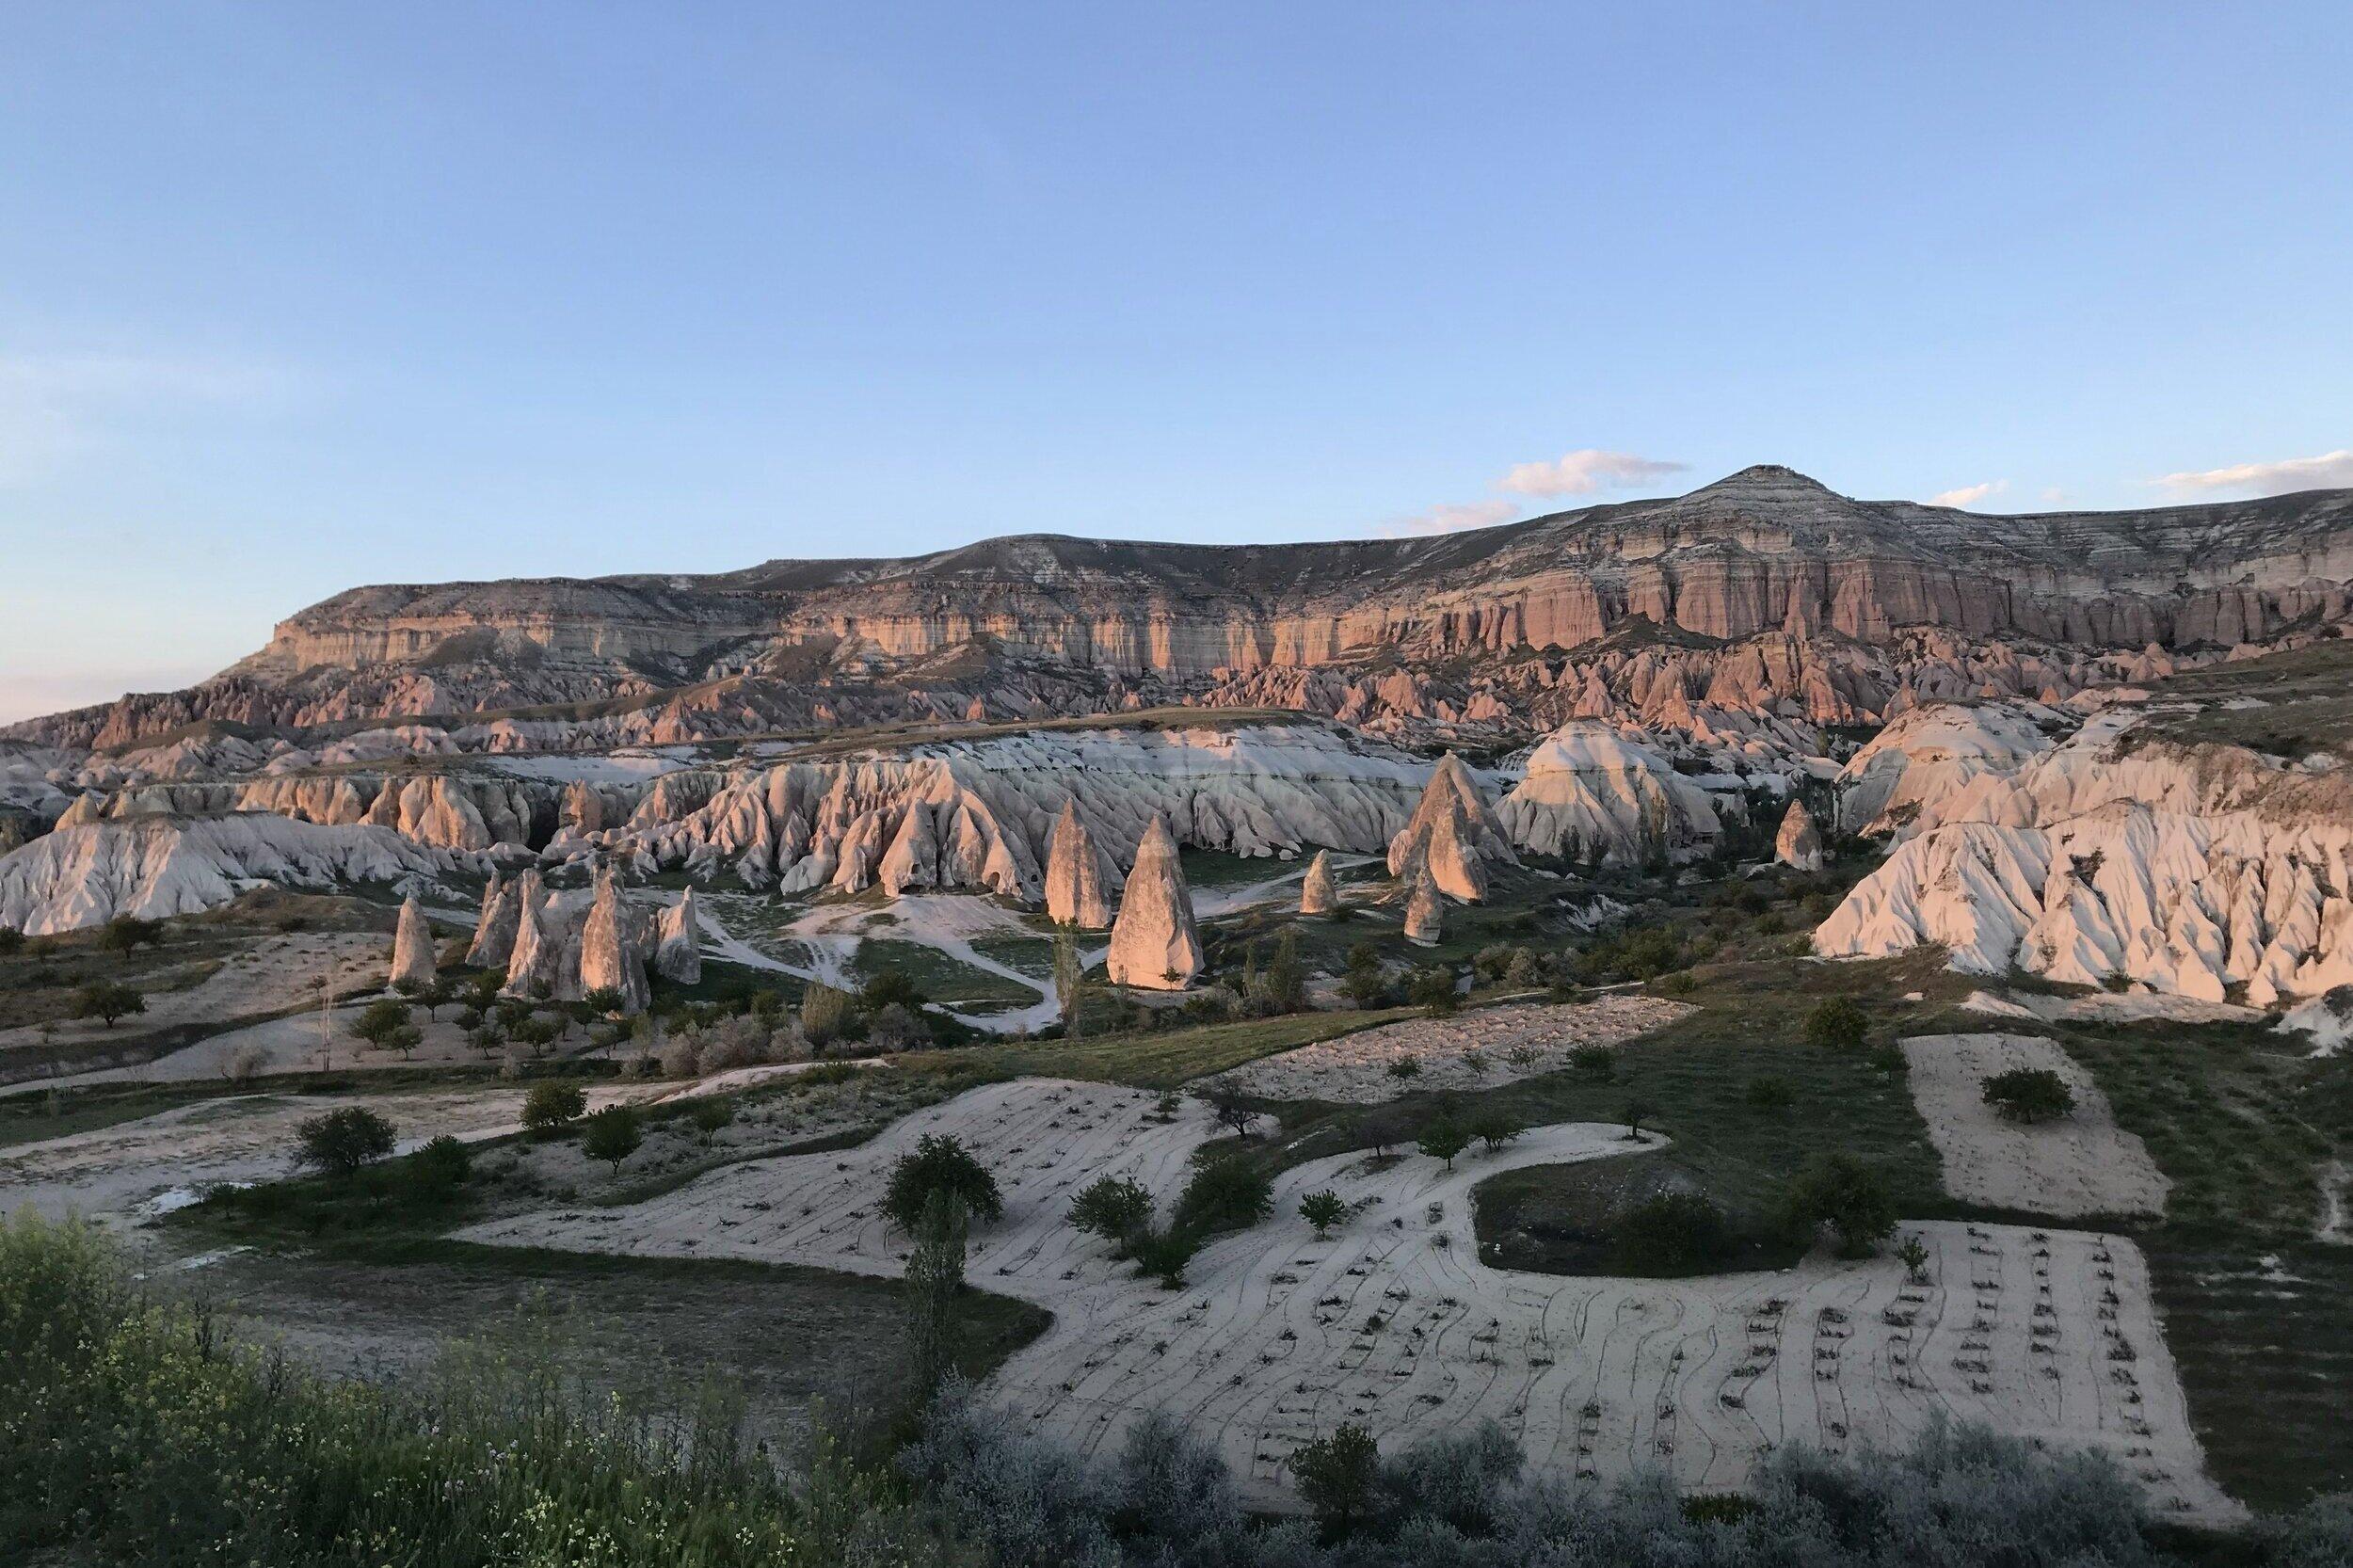 Views of Göreme National Park